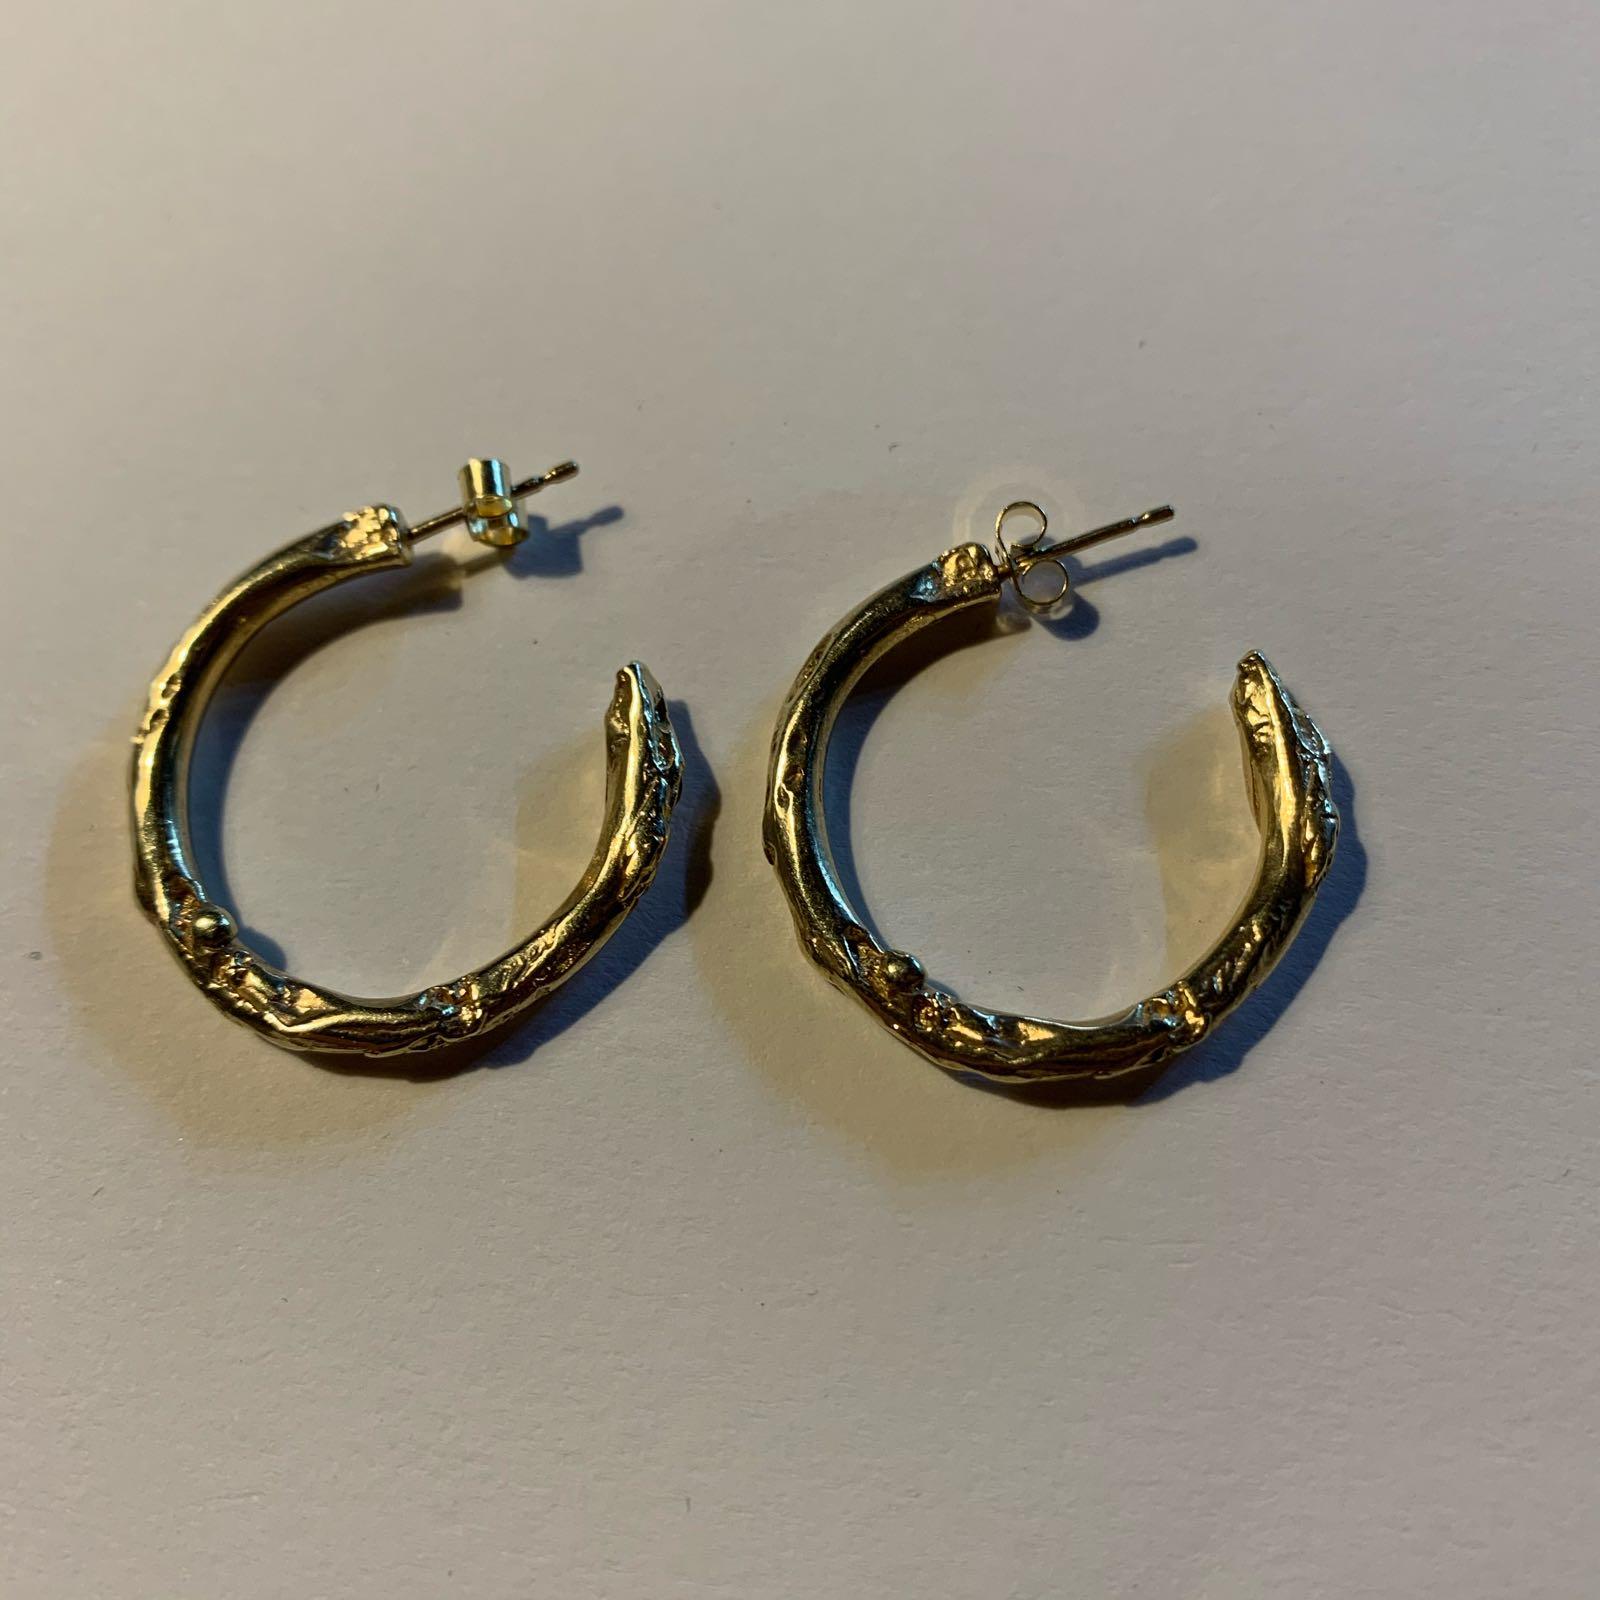 Samantha English Jewellery - Small Hoops